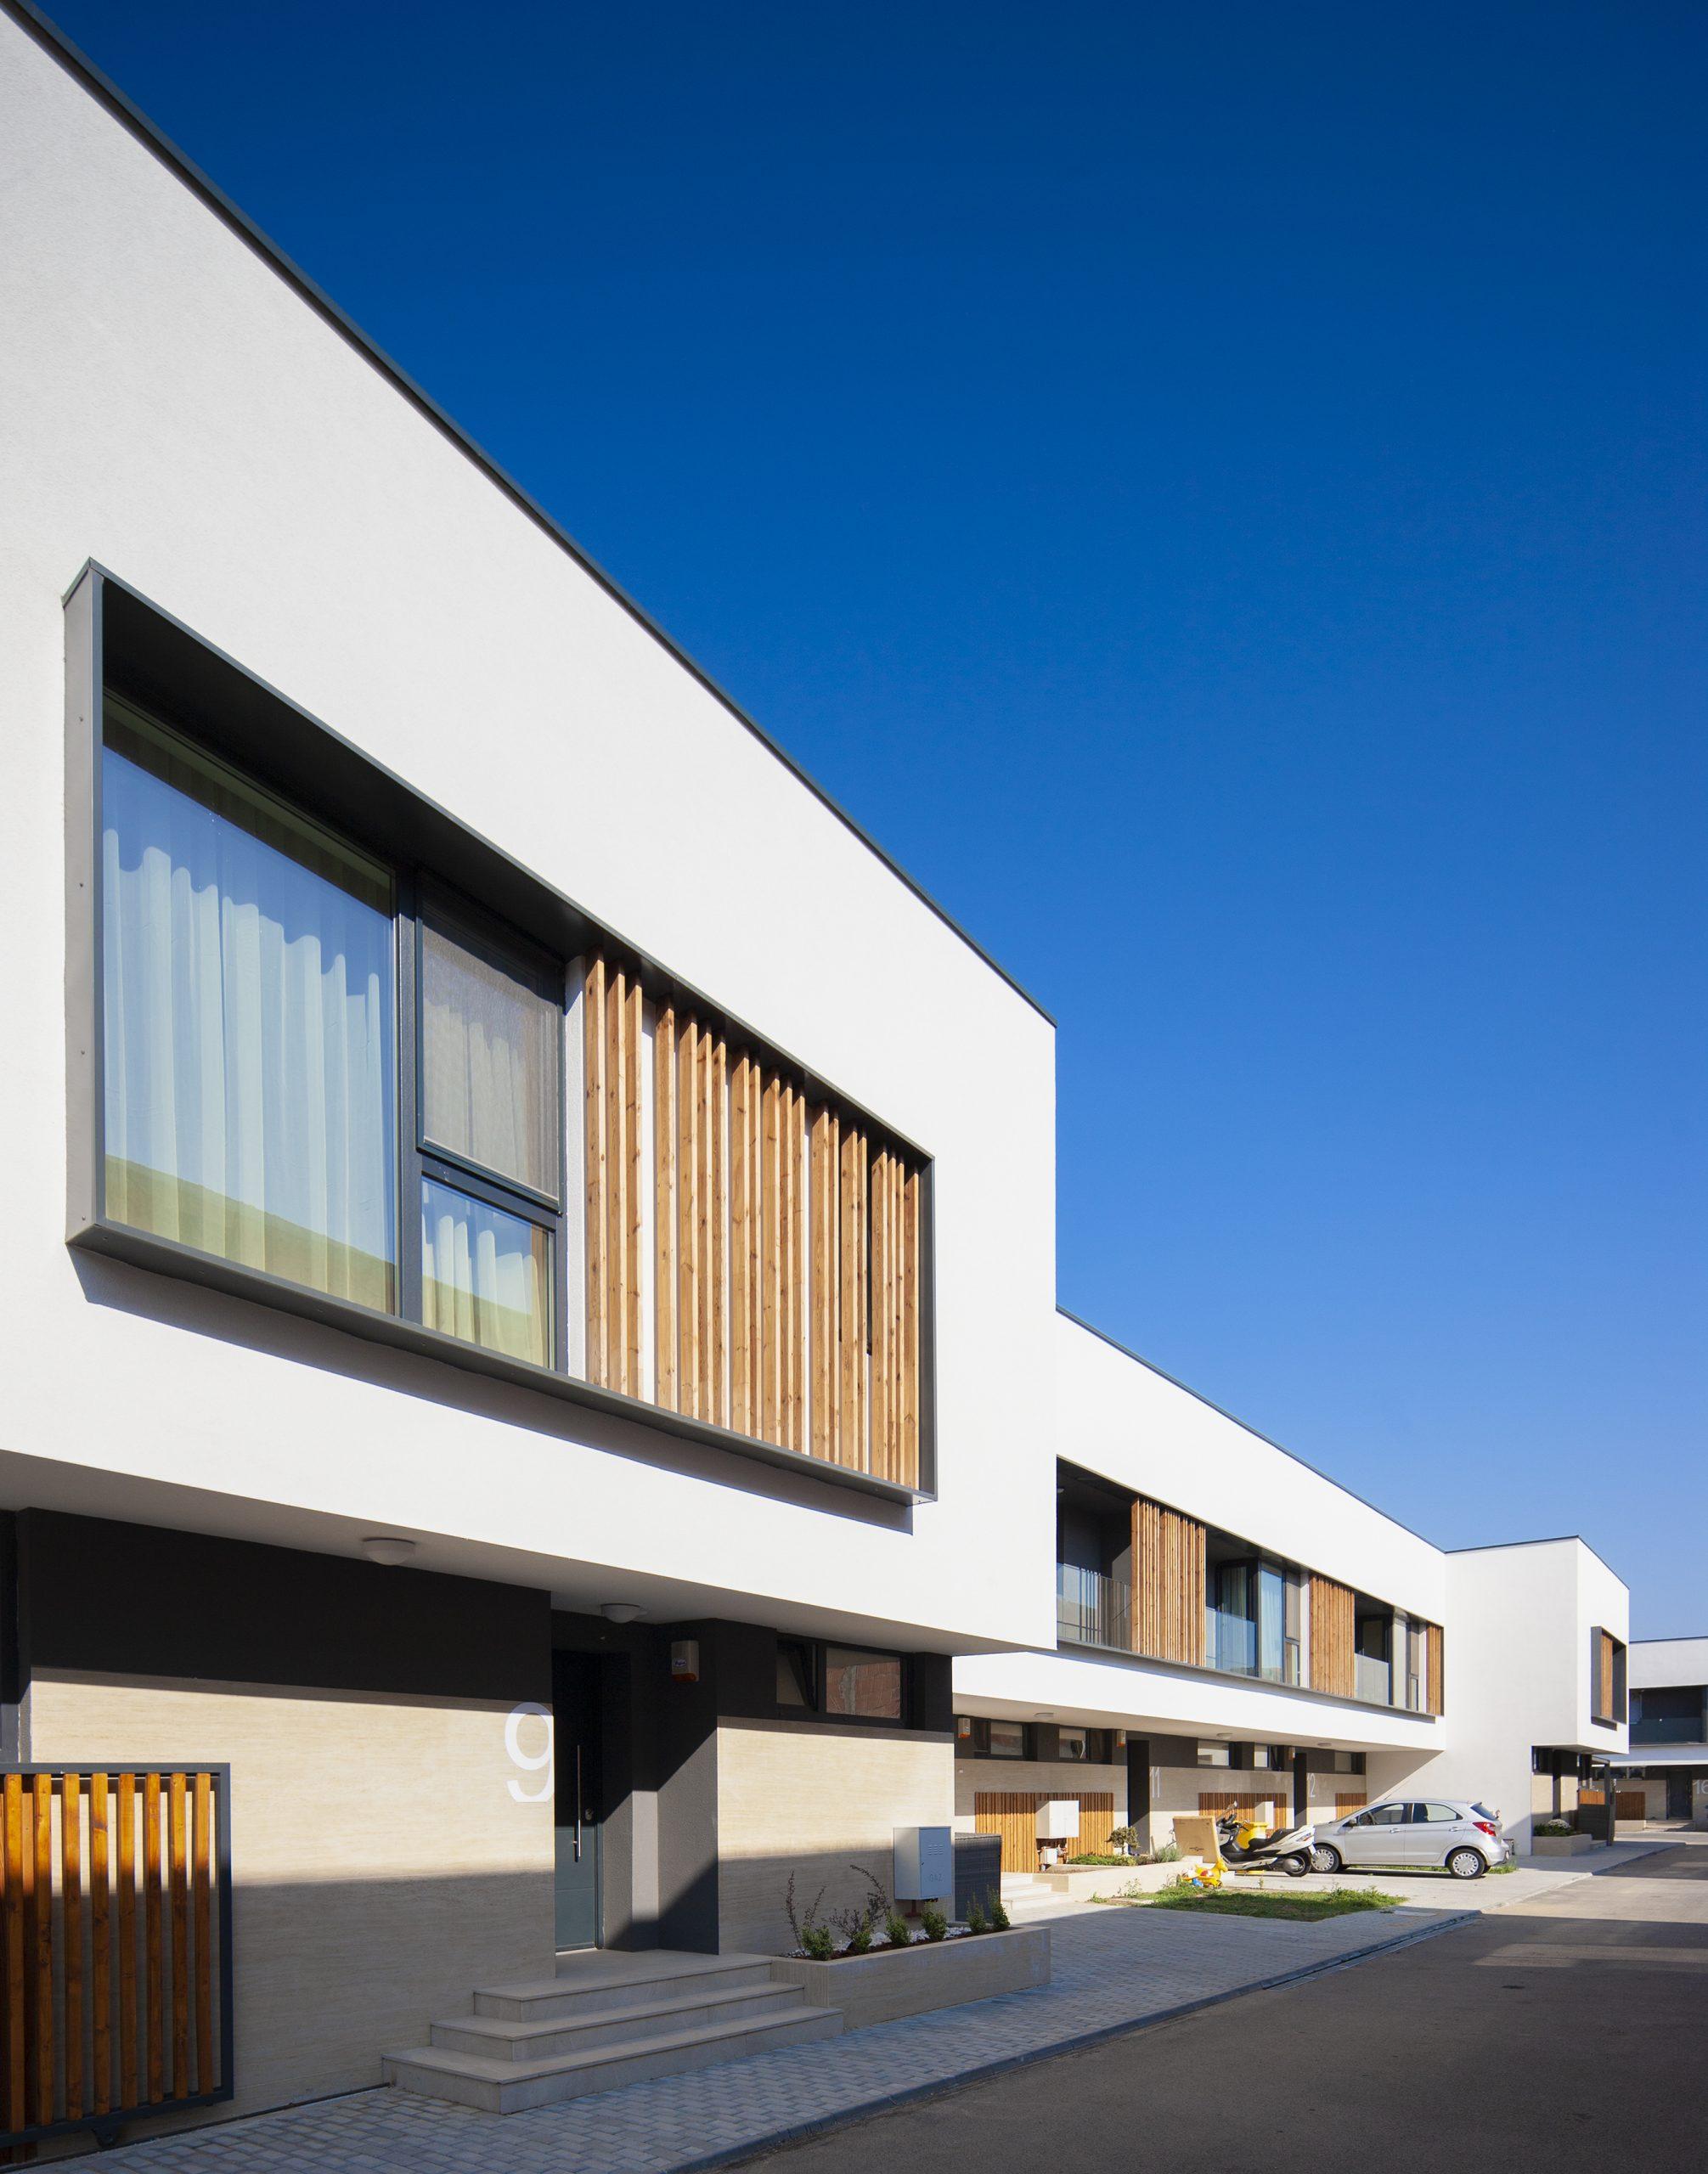 https://nbc-arhitect.ro/wp-content/uploads/2020/10/NBC-Arhitect-_-residentials-_-Contemporan-Residence-_-Bucharest-Romania_7-1-scaled.jpg